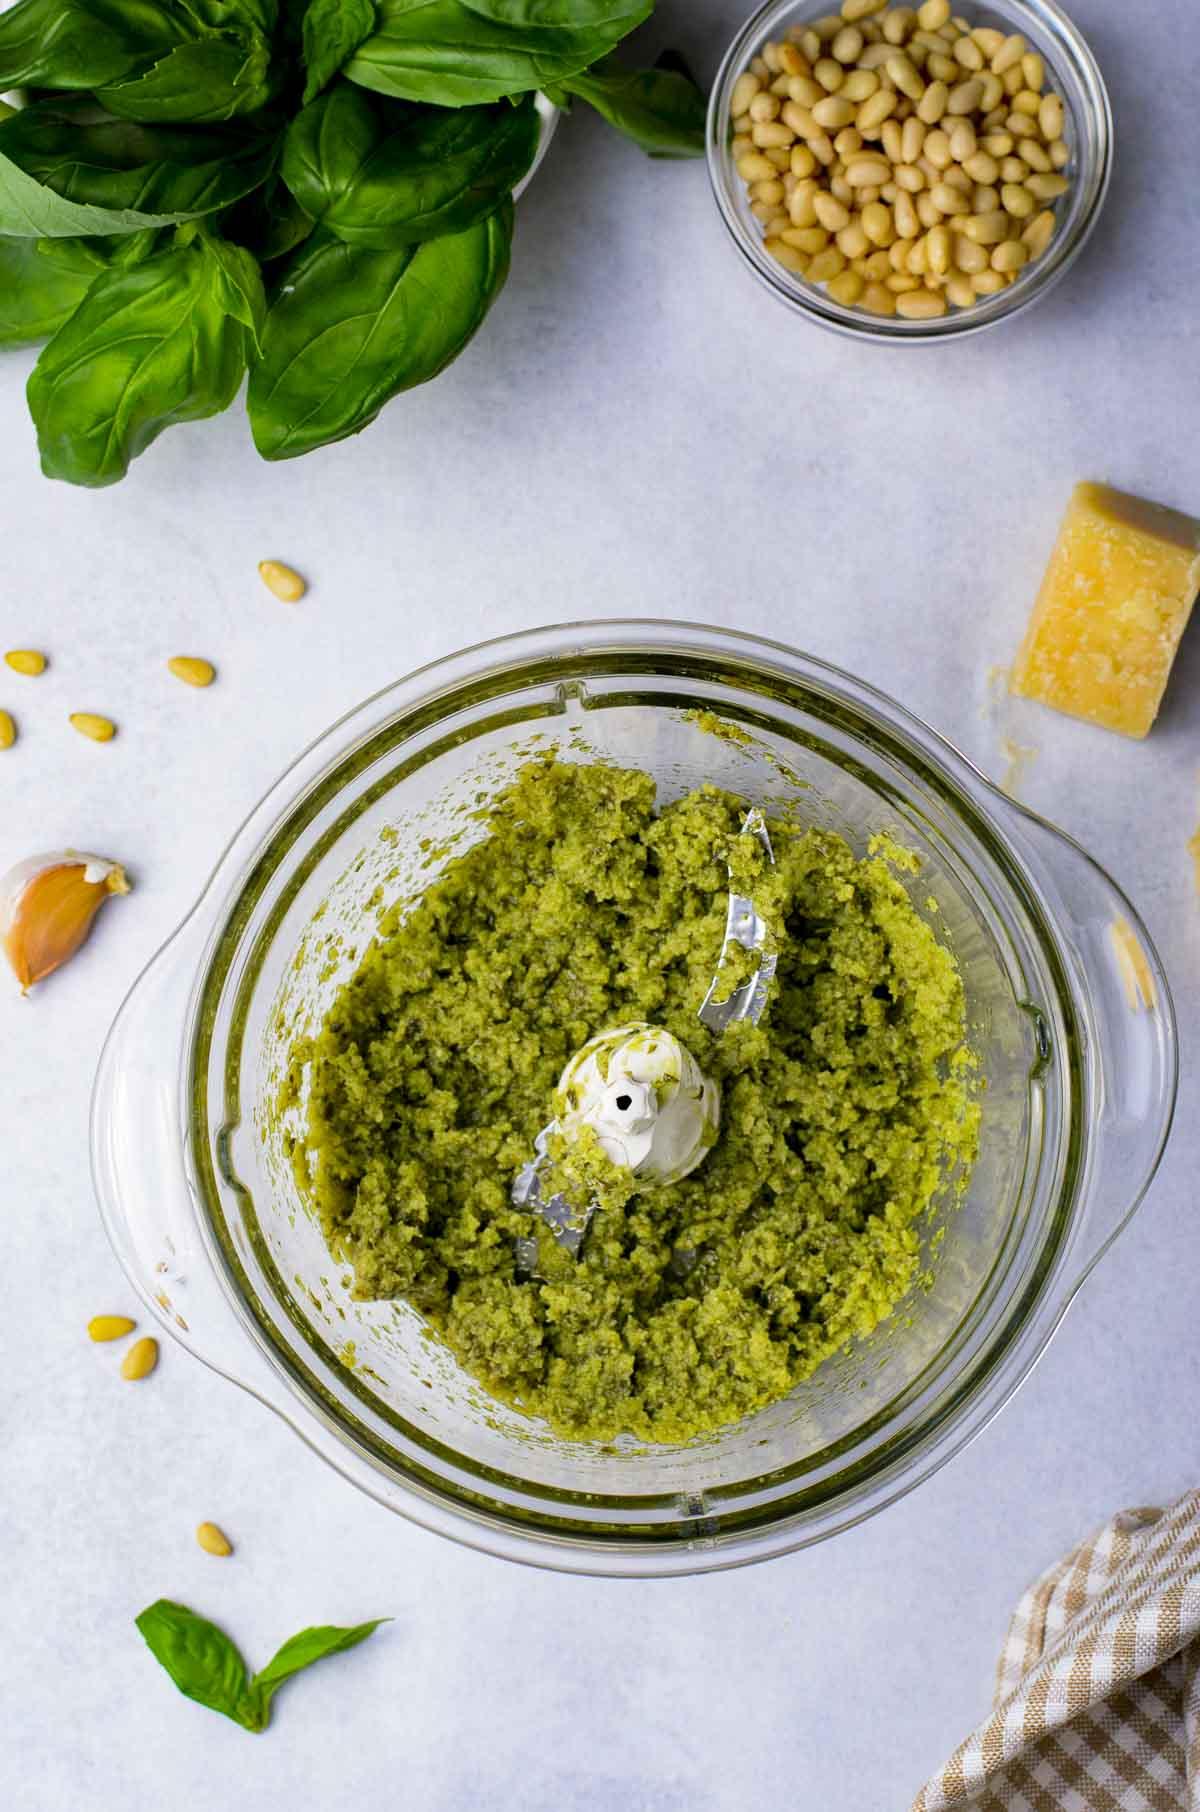 Pesto made in a food processor.